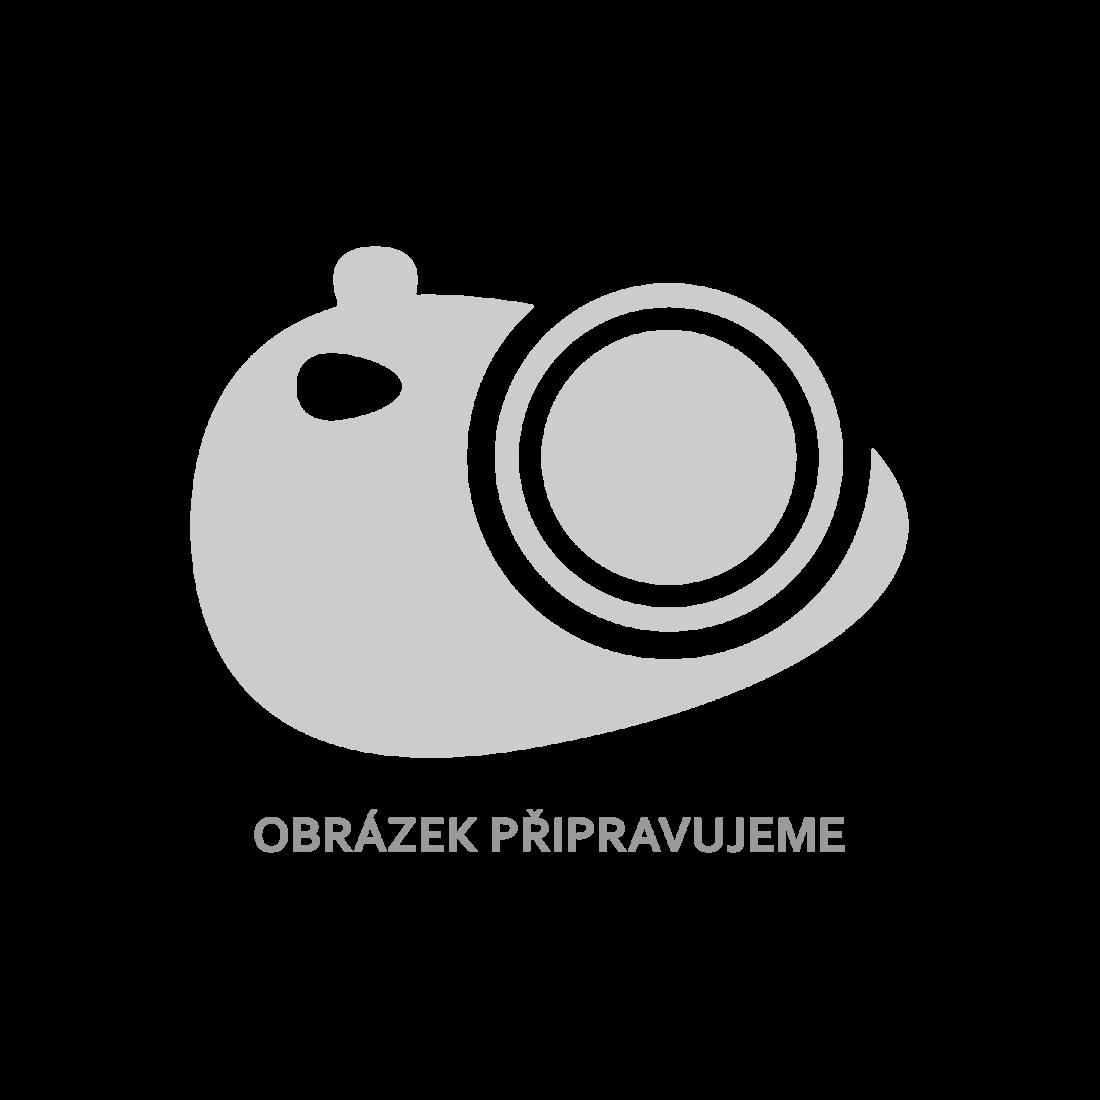 Roleta Zebra / noc a den / Twinroll 120 x 175 cm, bílá